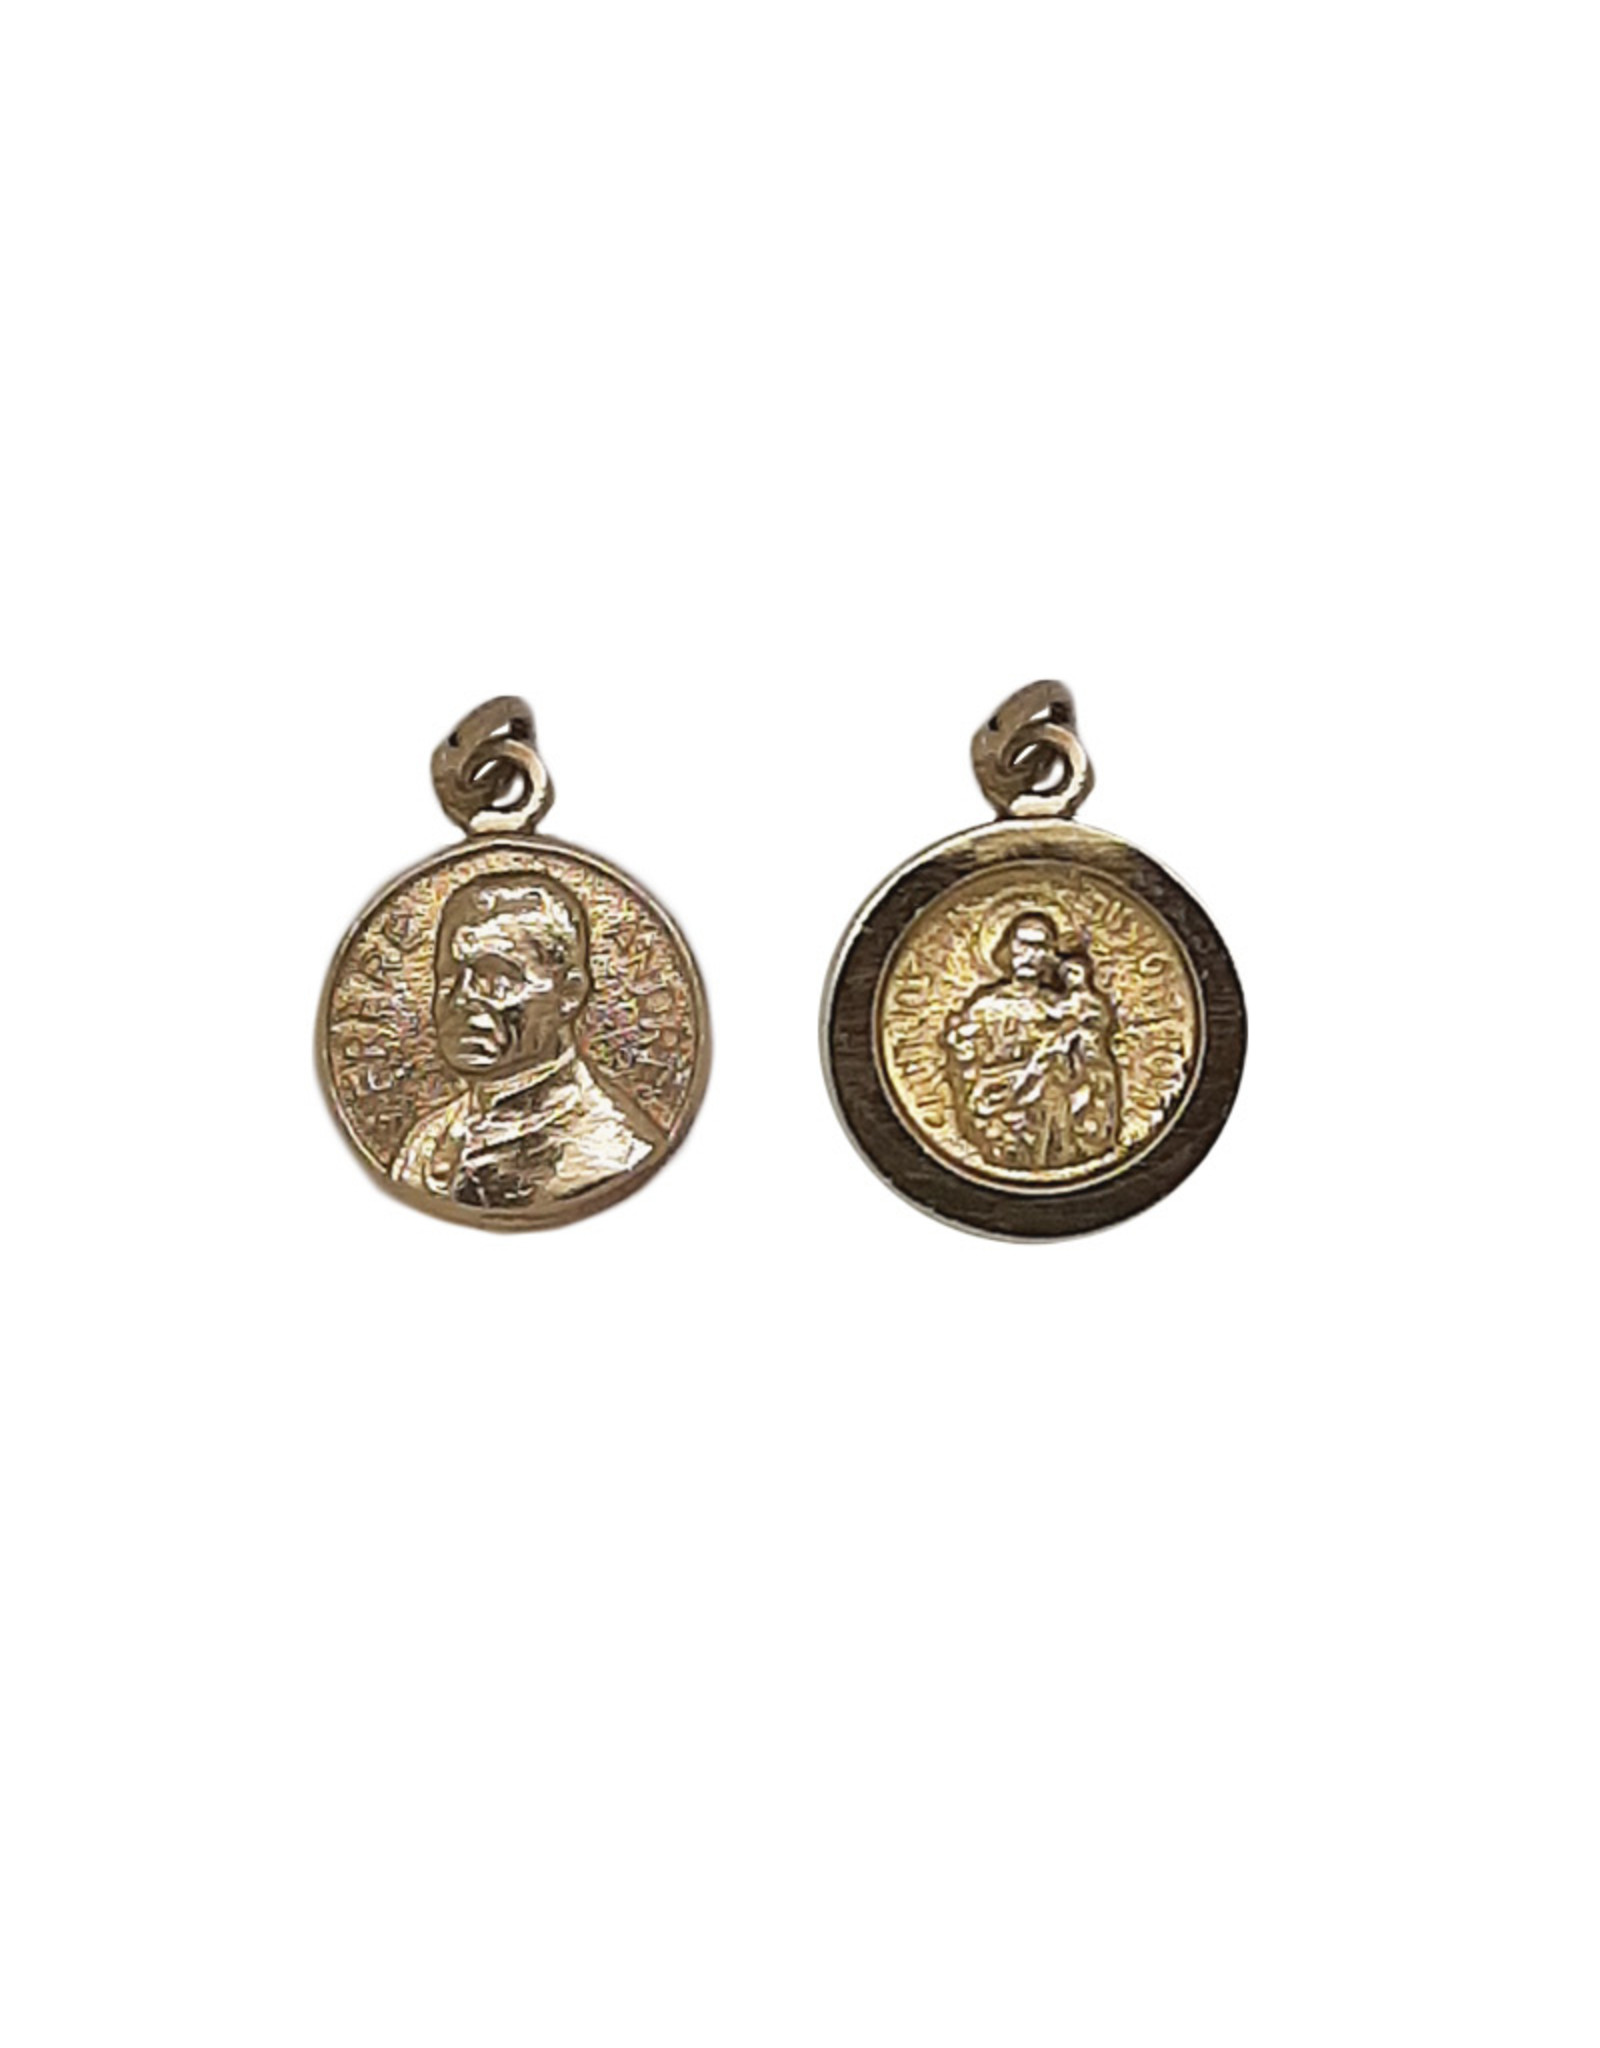 Saint Brother André / Saint Joseph medal, 10k gold (15mm)